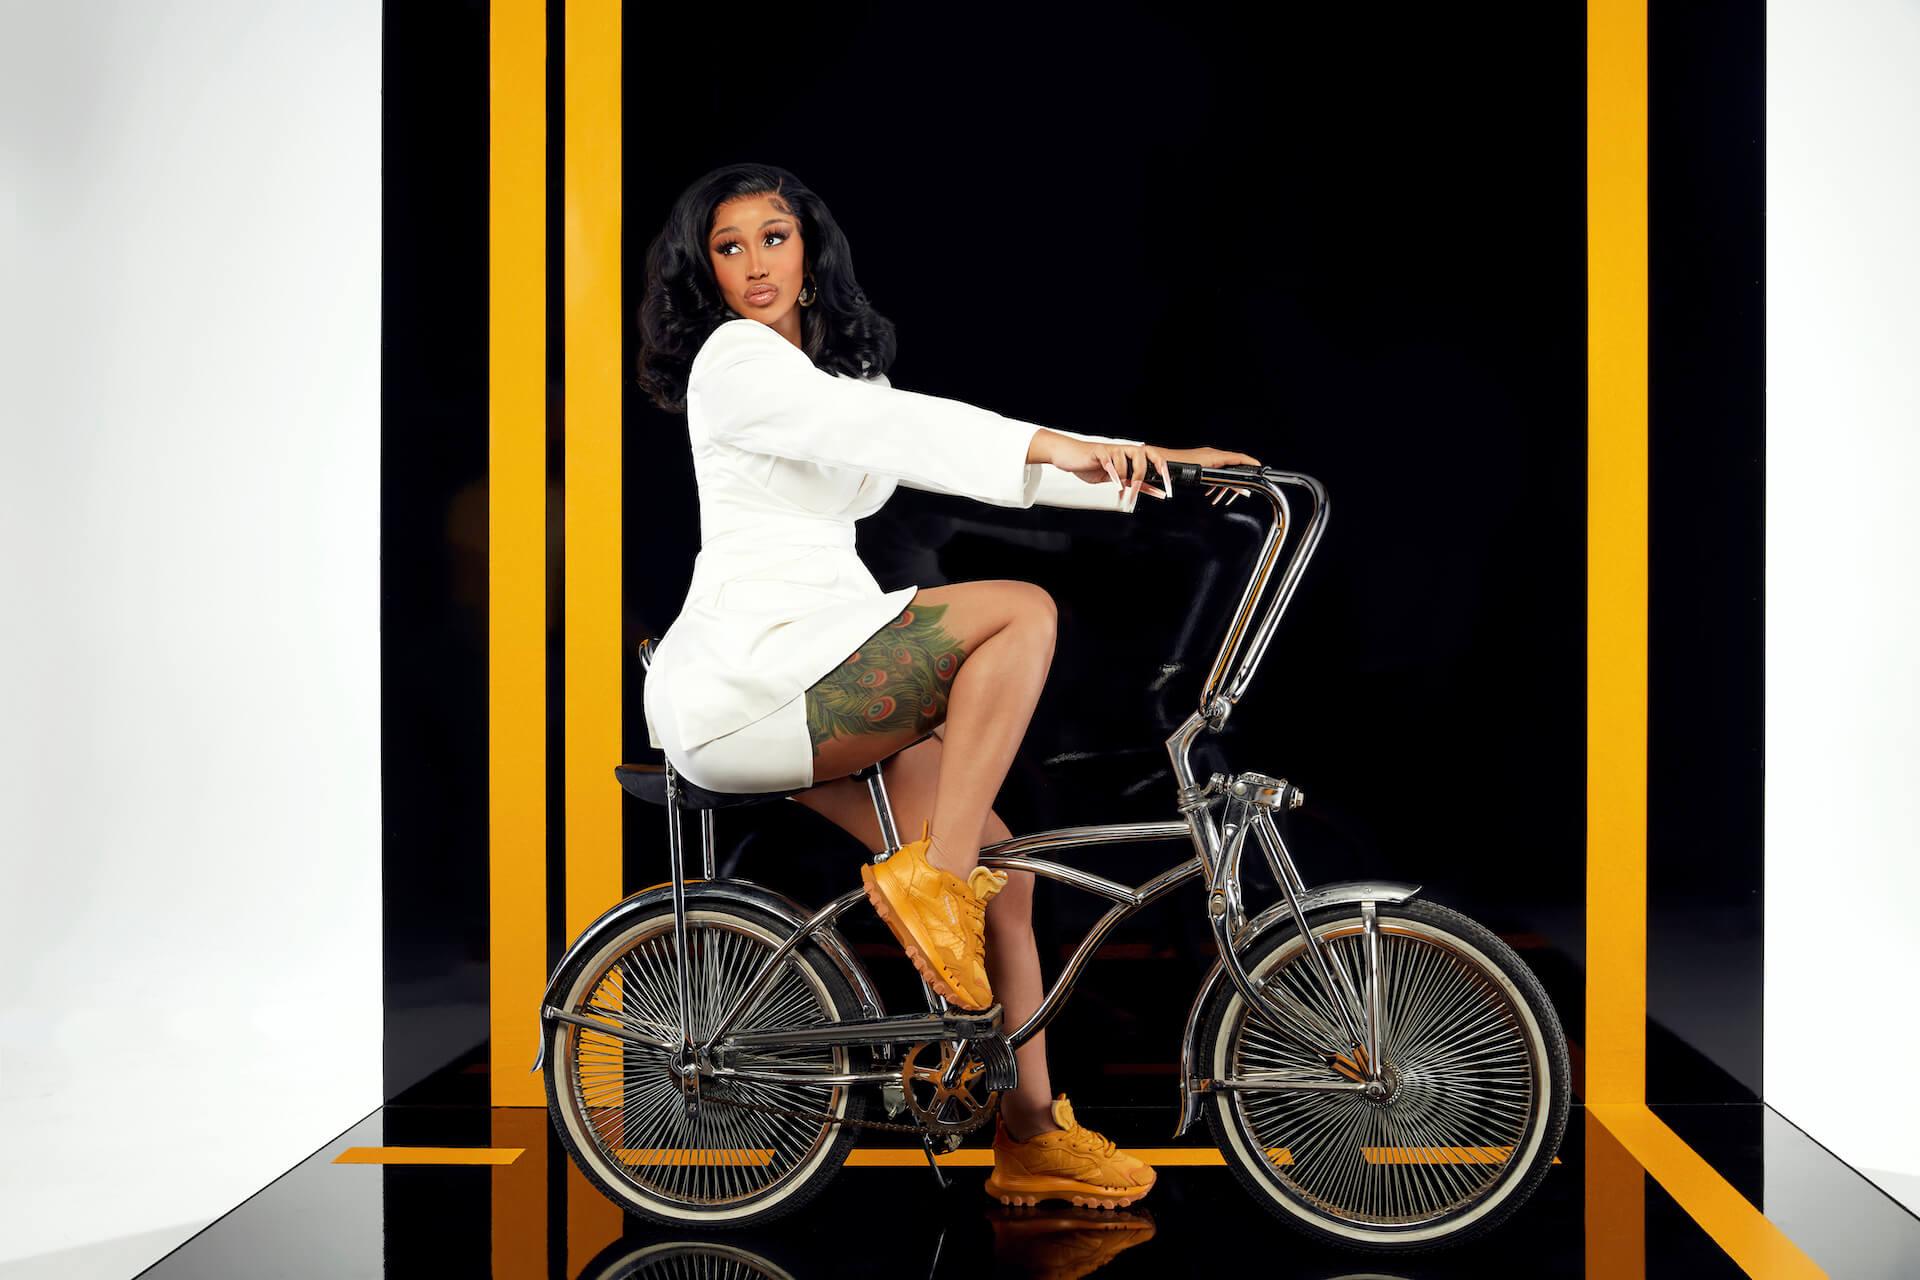 Cardi BとReebokのコラボコレクションに新モデル「CLASSIC LEATHER CARDI」が登場! Fashion_210713_cardib3